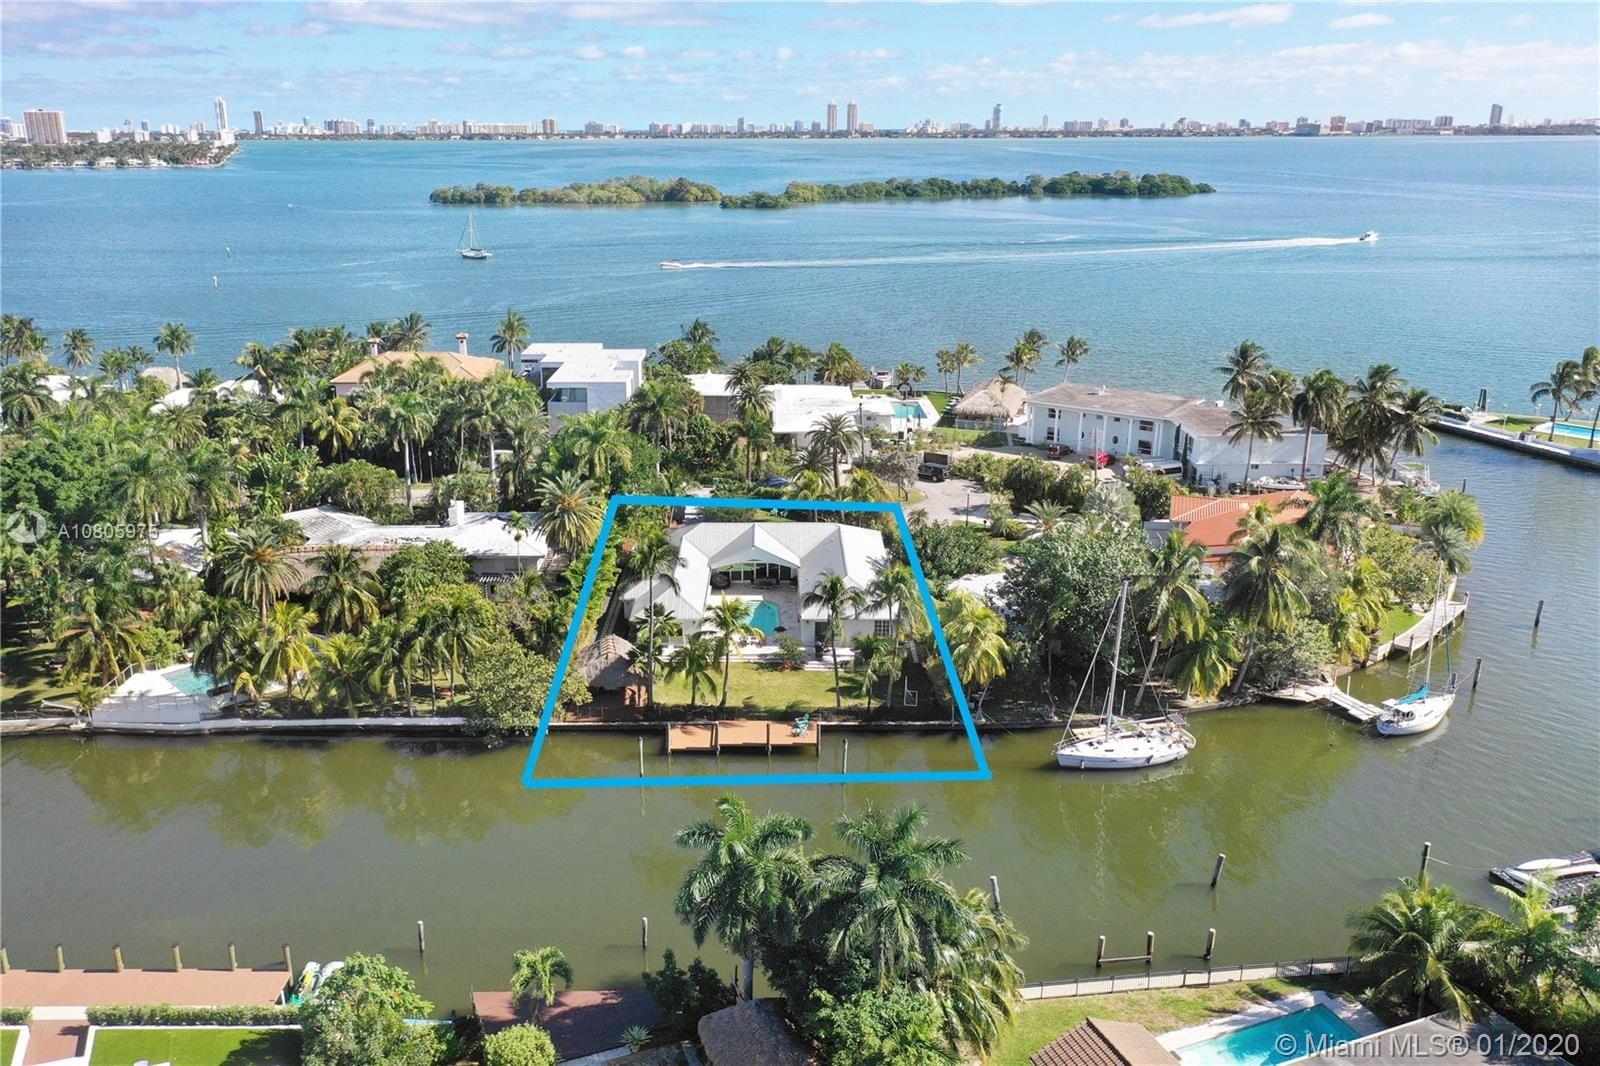 7308 Belle Meade Island Dr, Miami, FL 33138 - #: A10805975